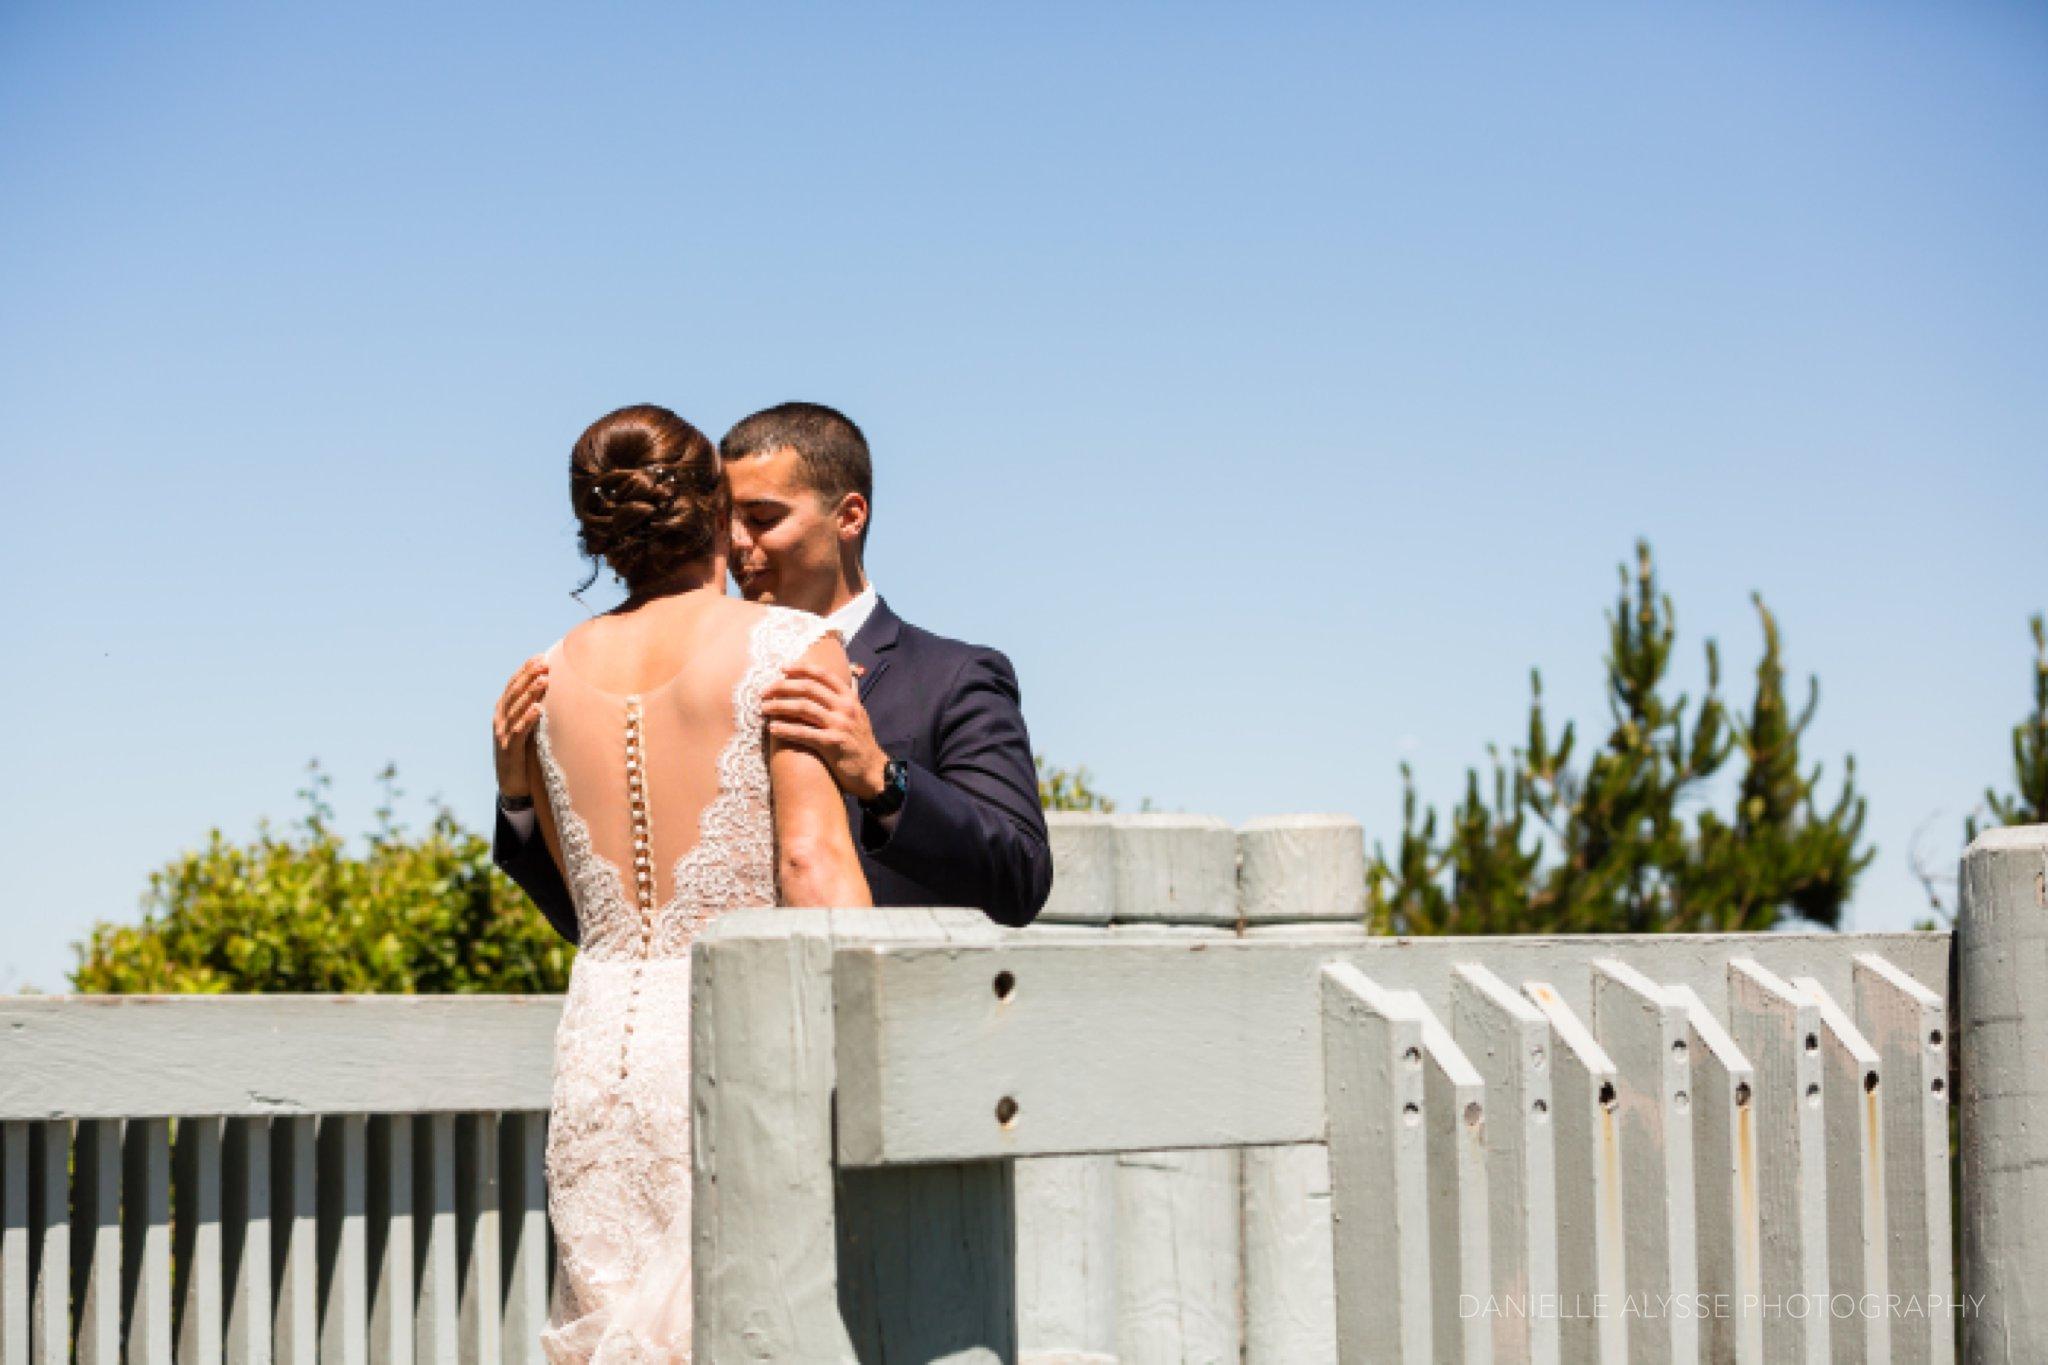 170429_blog_kimberly_ben_wedding_san_mateo_curiodyssey_danielle_alysse_photography_sacramento_photographer0164_WEB.jpg